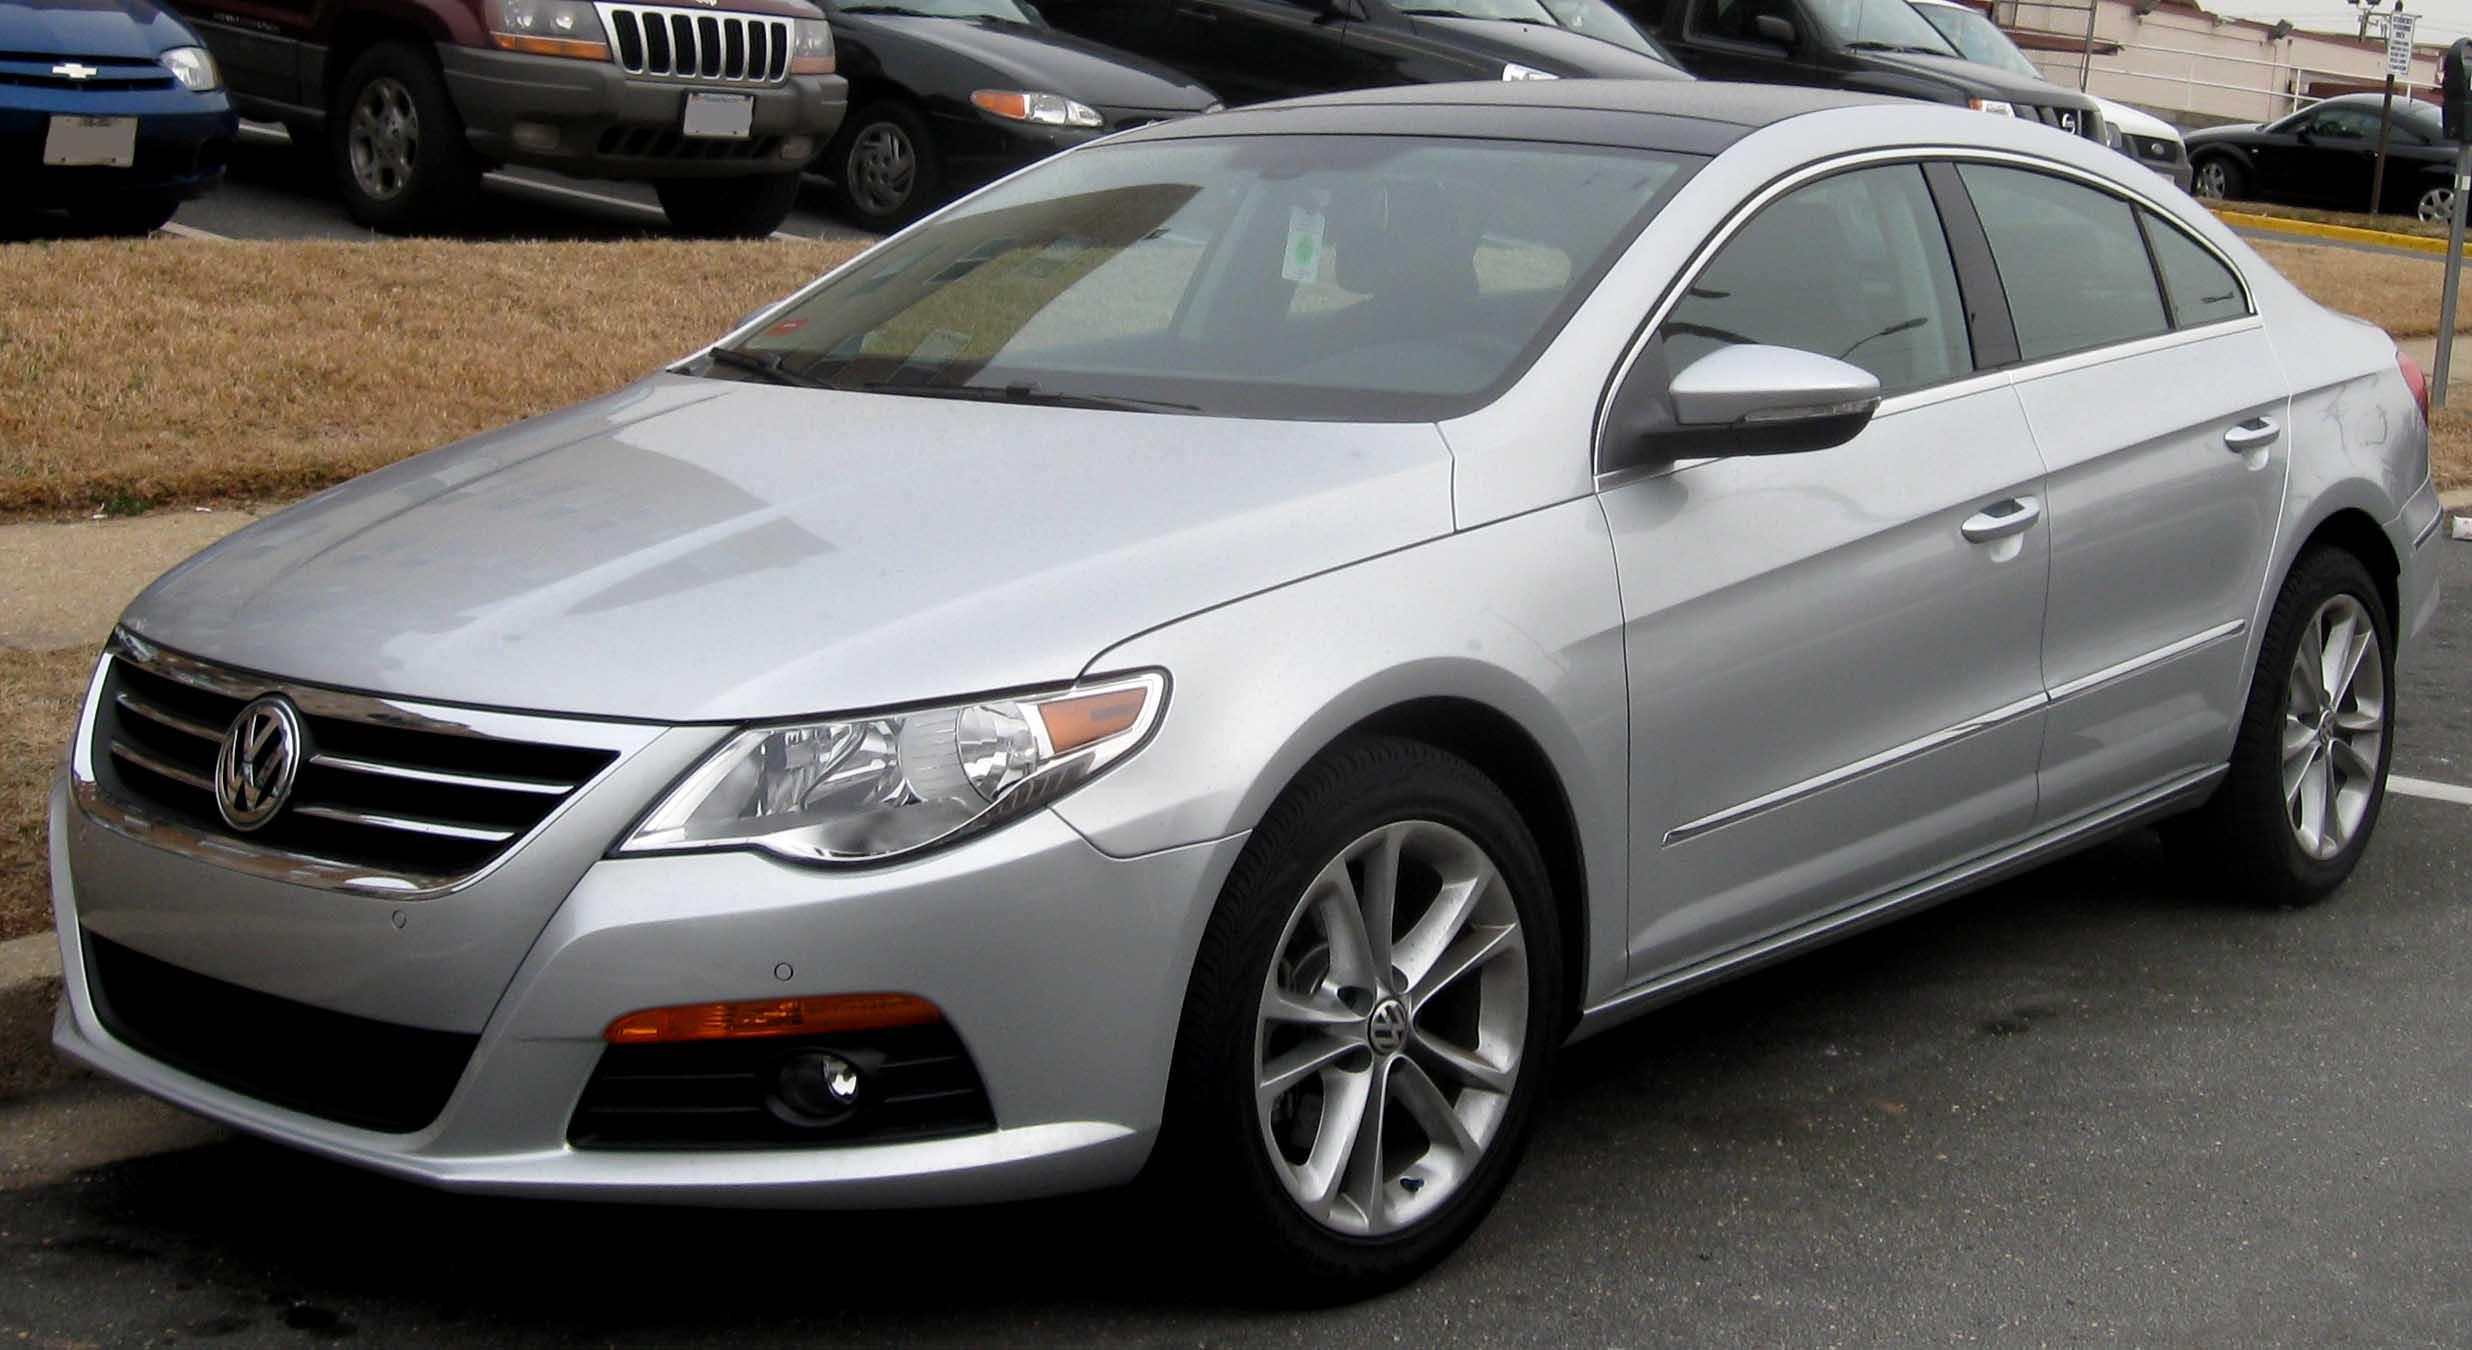 Datei:2009 Volkswagen CC.jpg – Wikipedia